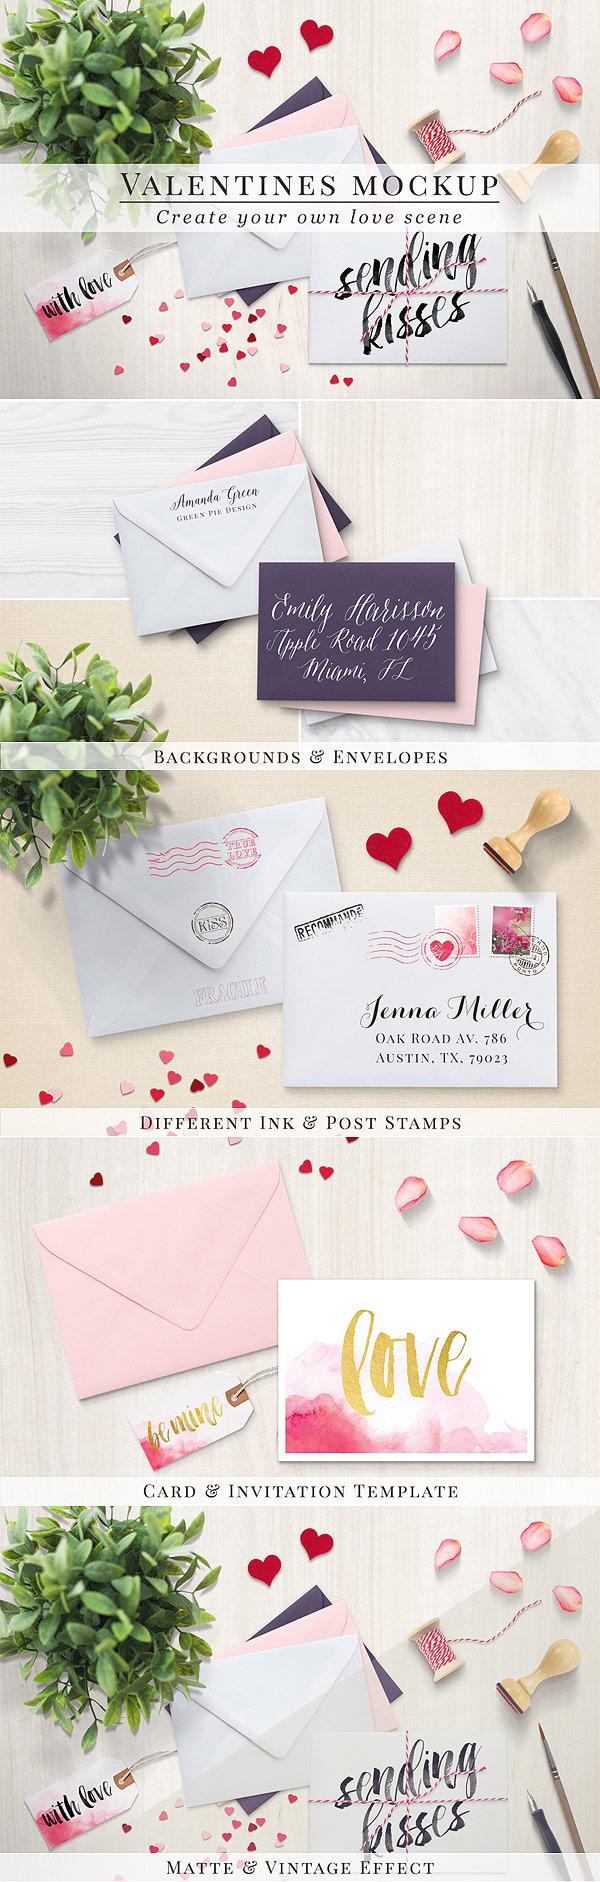 Valentines mockup - envelopes (46)